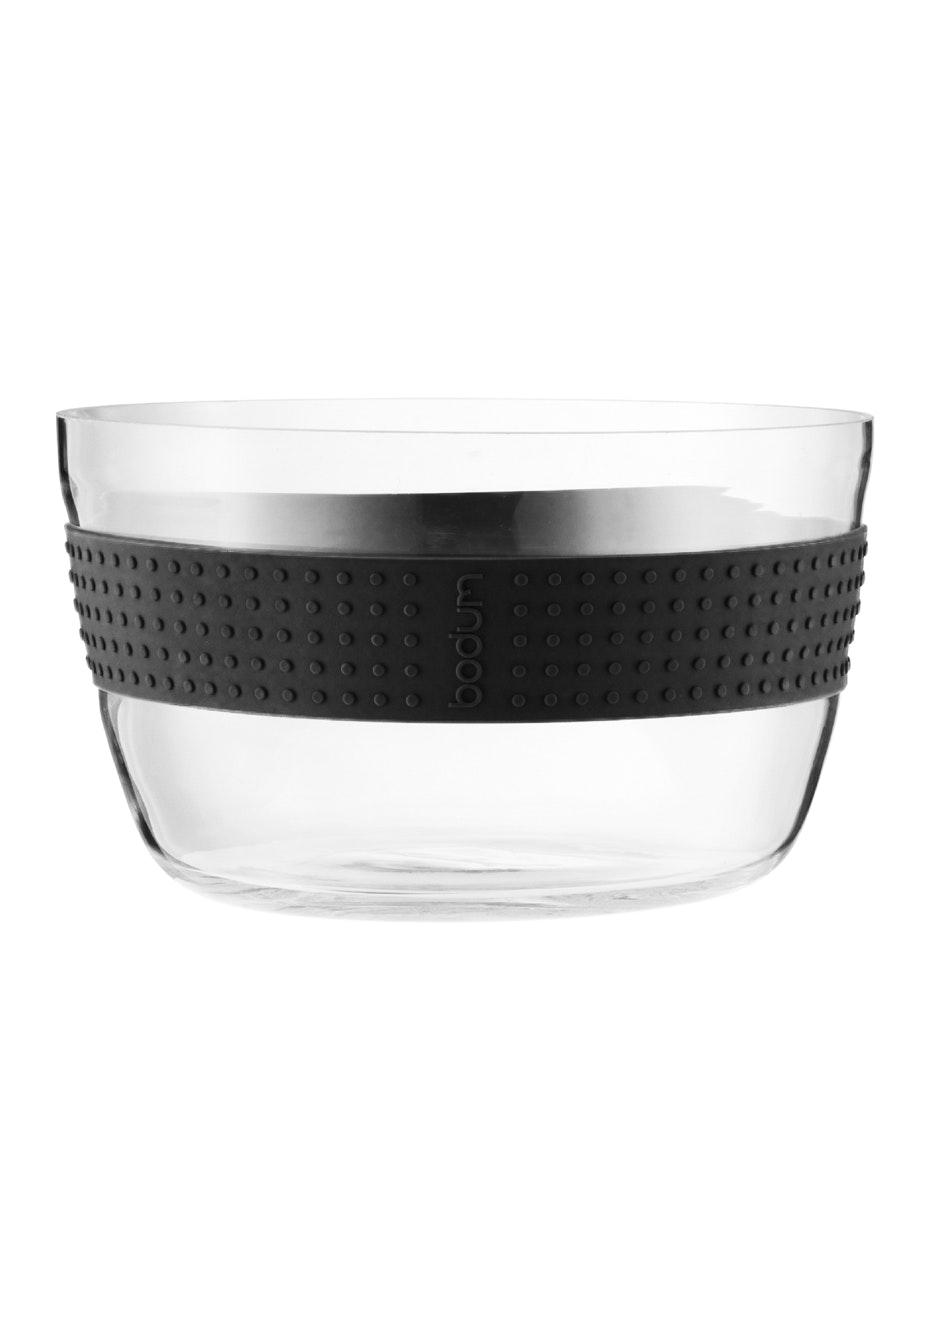 Bodum - Salad Bowl & Servers - Black